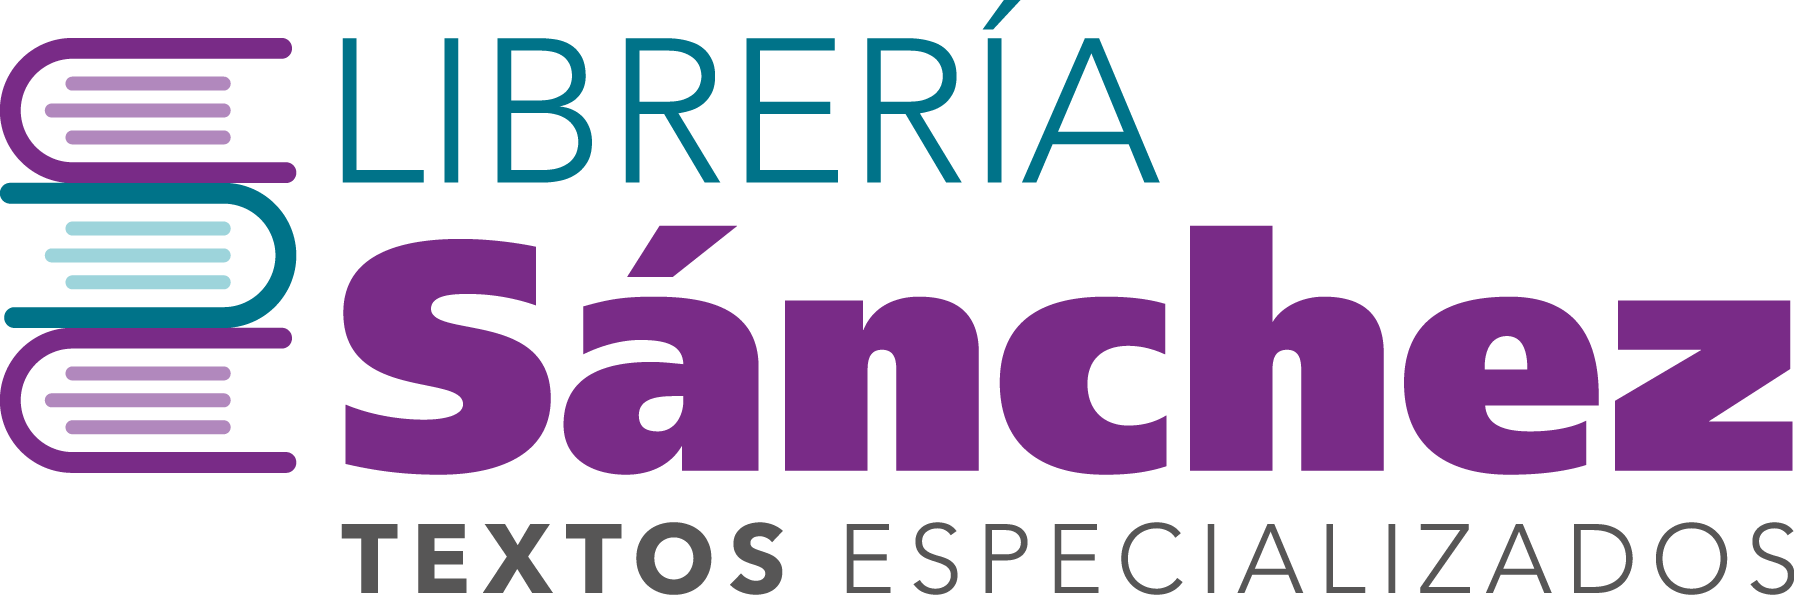 Libreria Sánchez